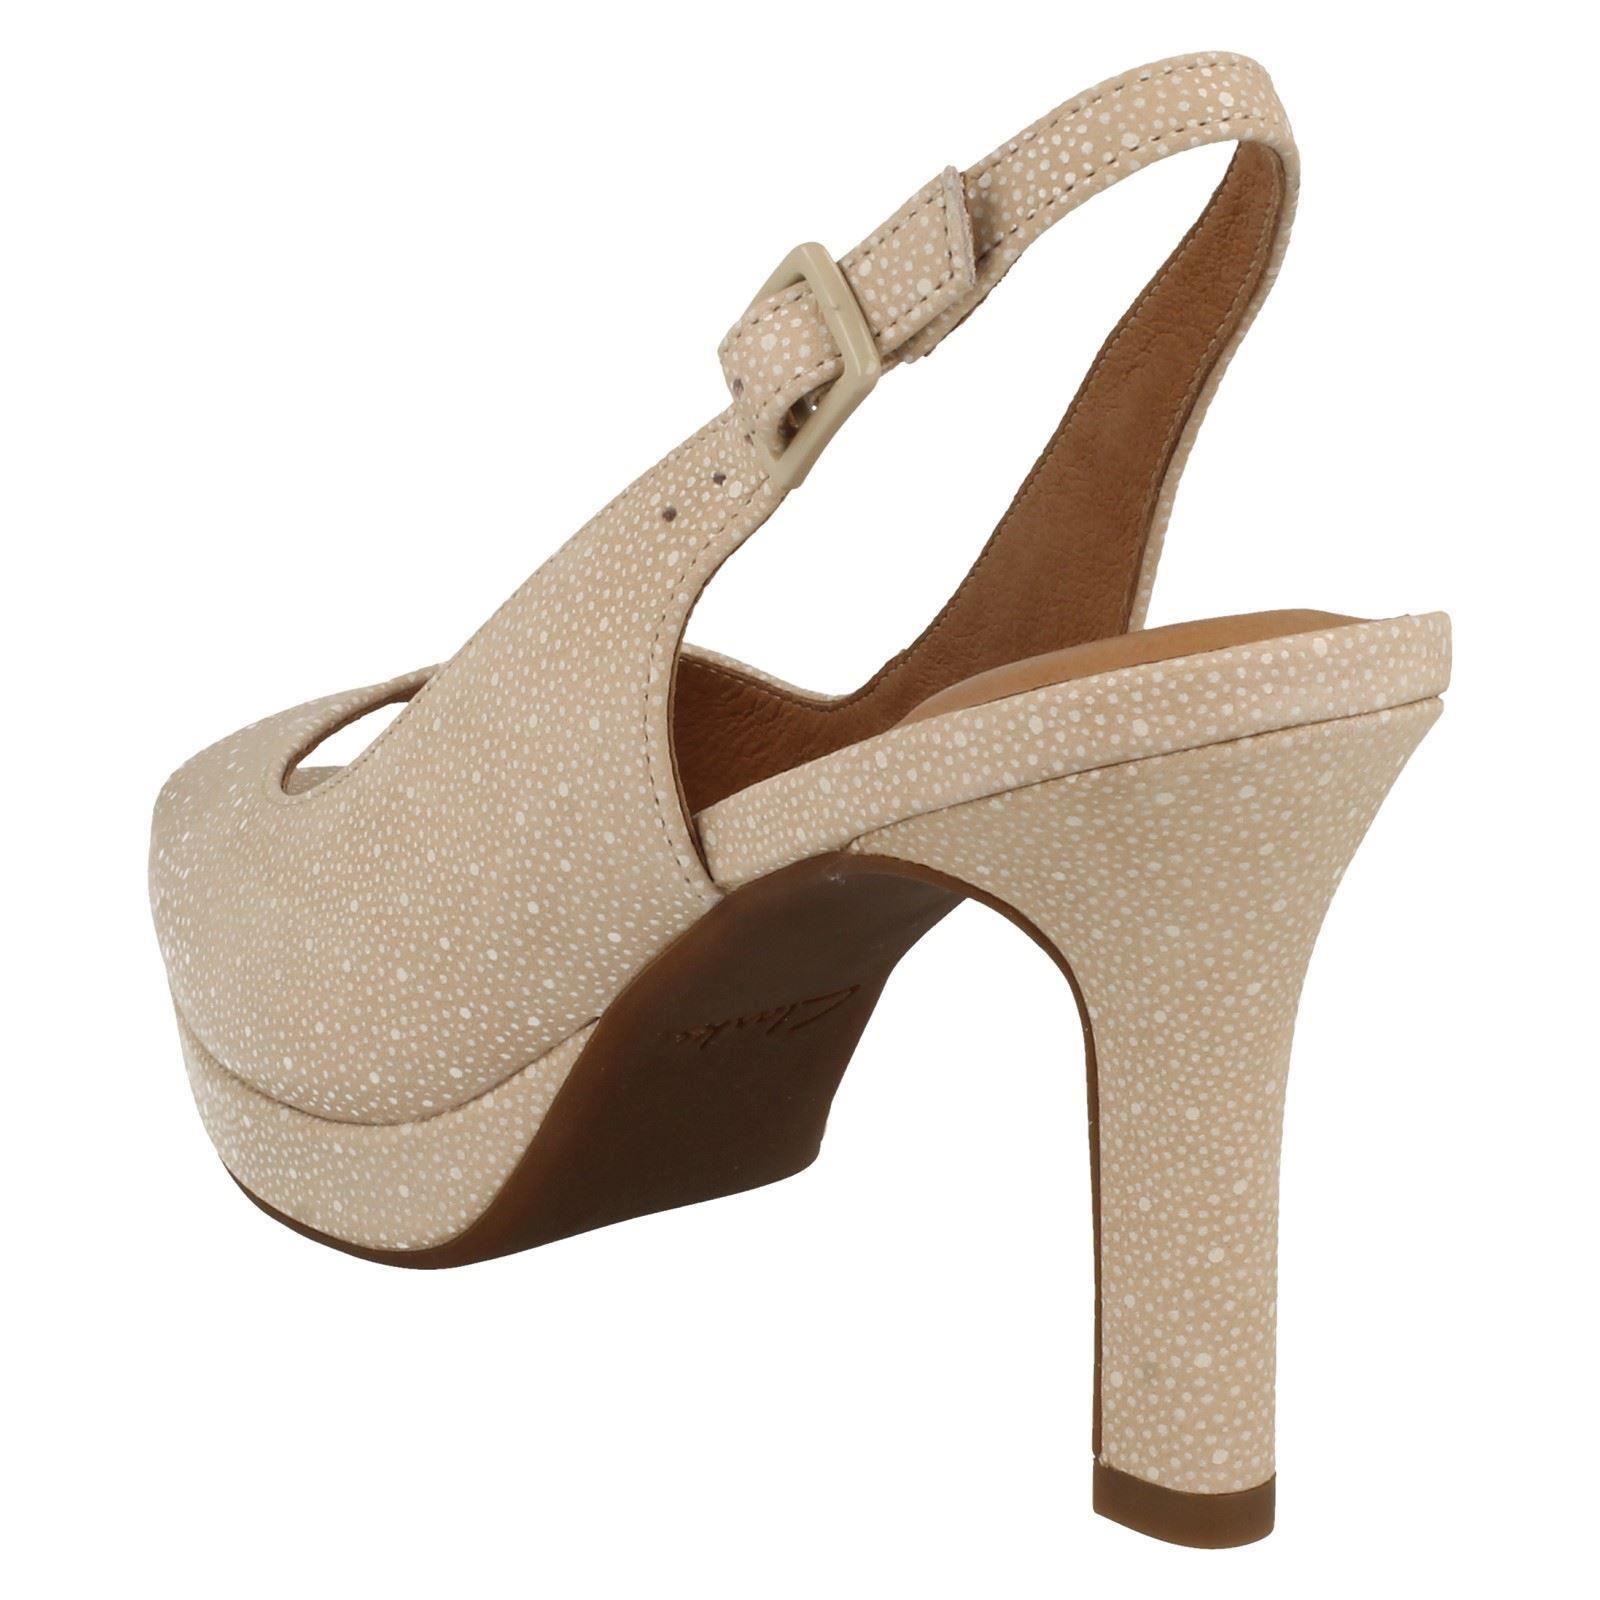 Ladies-Clarks-Heeled-Sandals-034-Mayra-Blossom-034 4ca5f12511